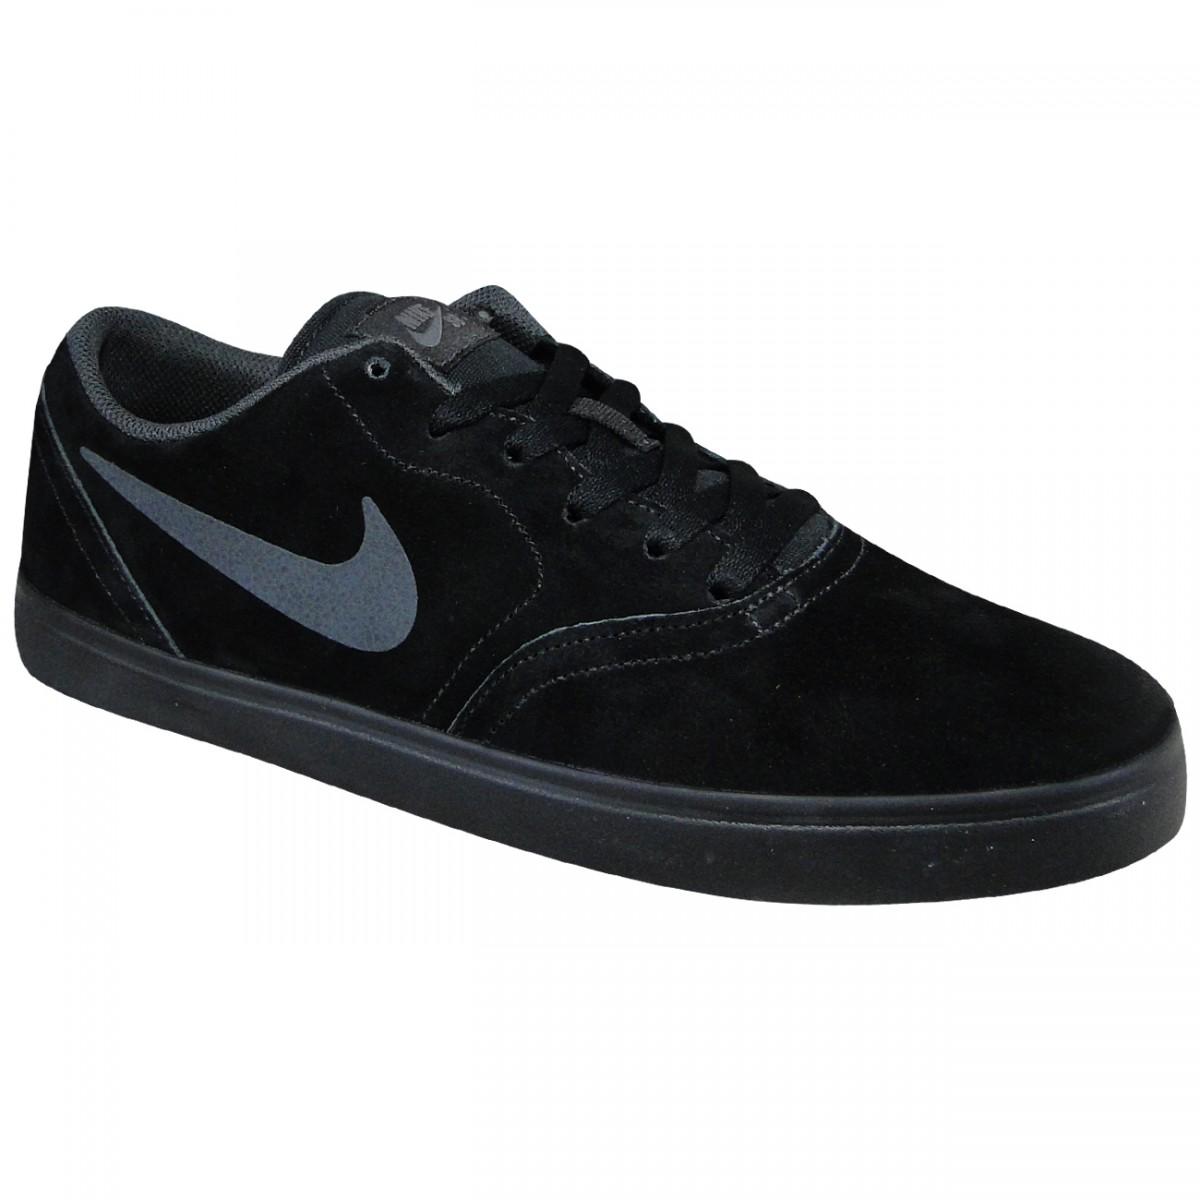 bb78fd853af Tenis Nike SB Check 705265 005 - Preto Preto - Chuteira Nike